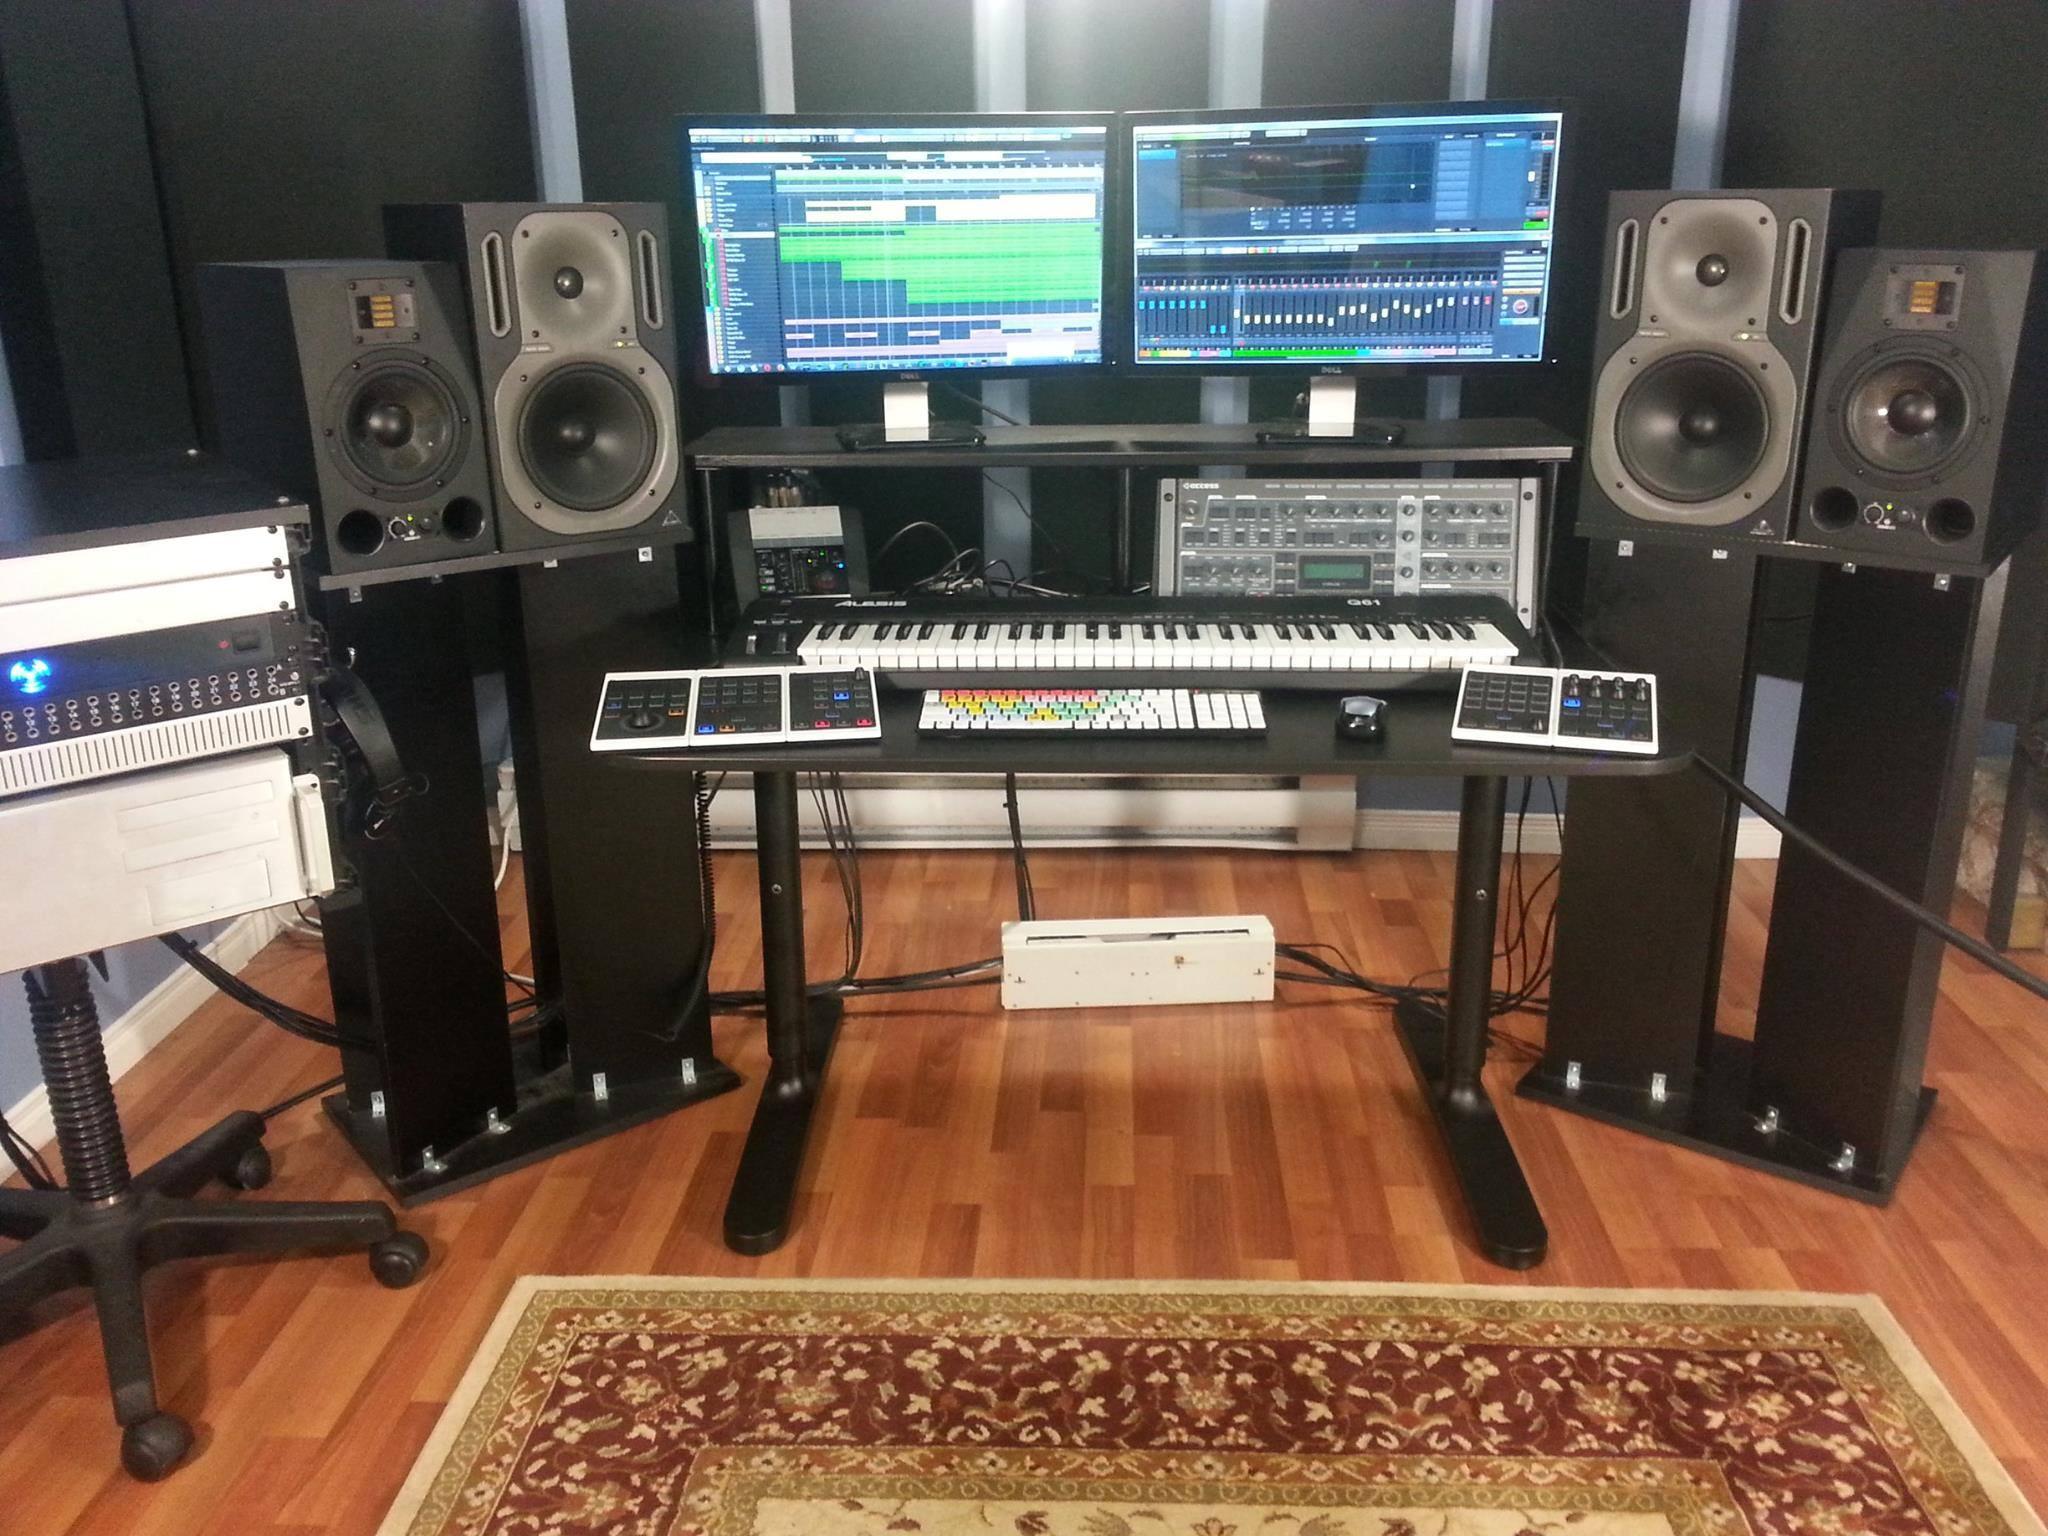 1 Mastering Track, EDM, Pop, Hip-Hop,  In A Professional Studio.